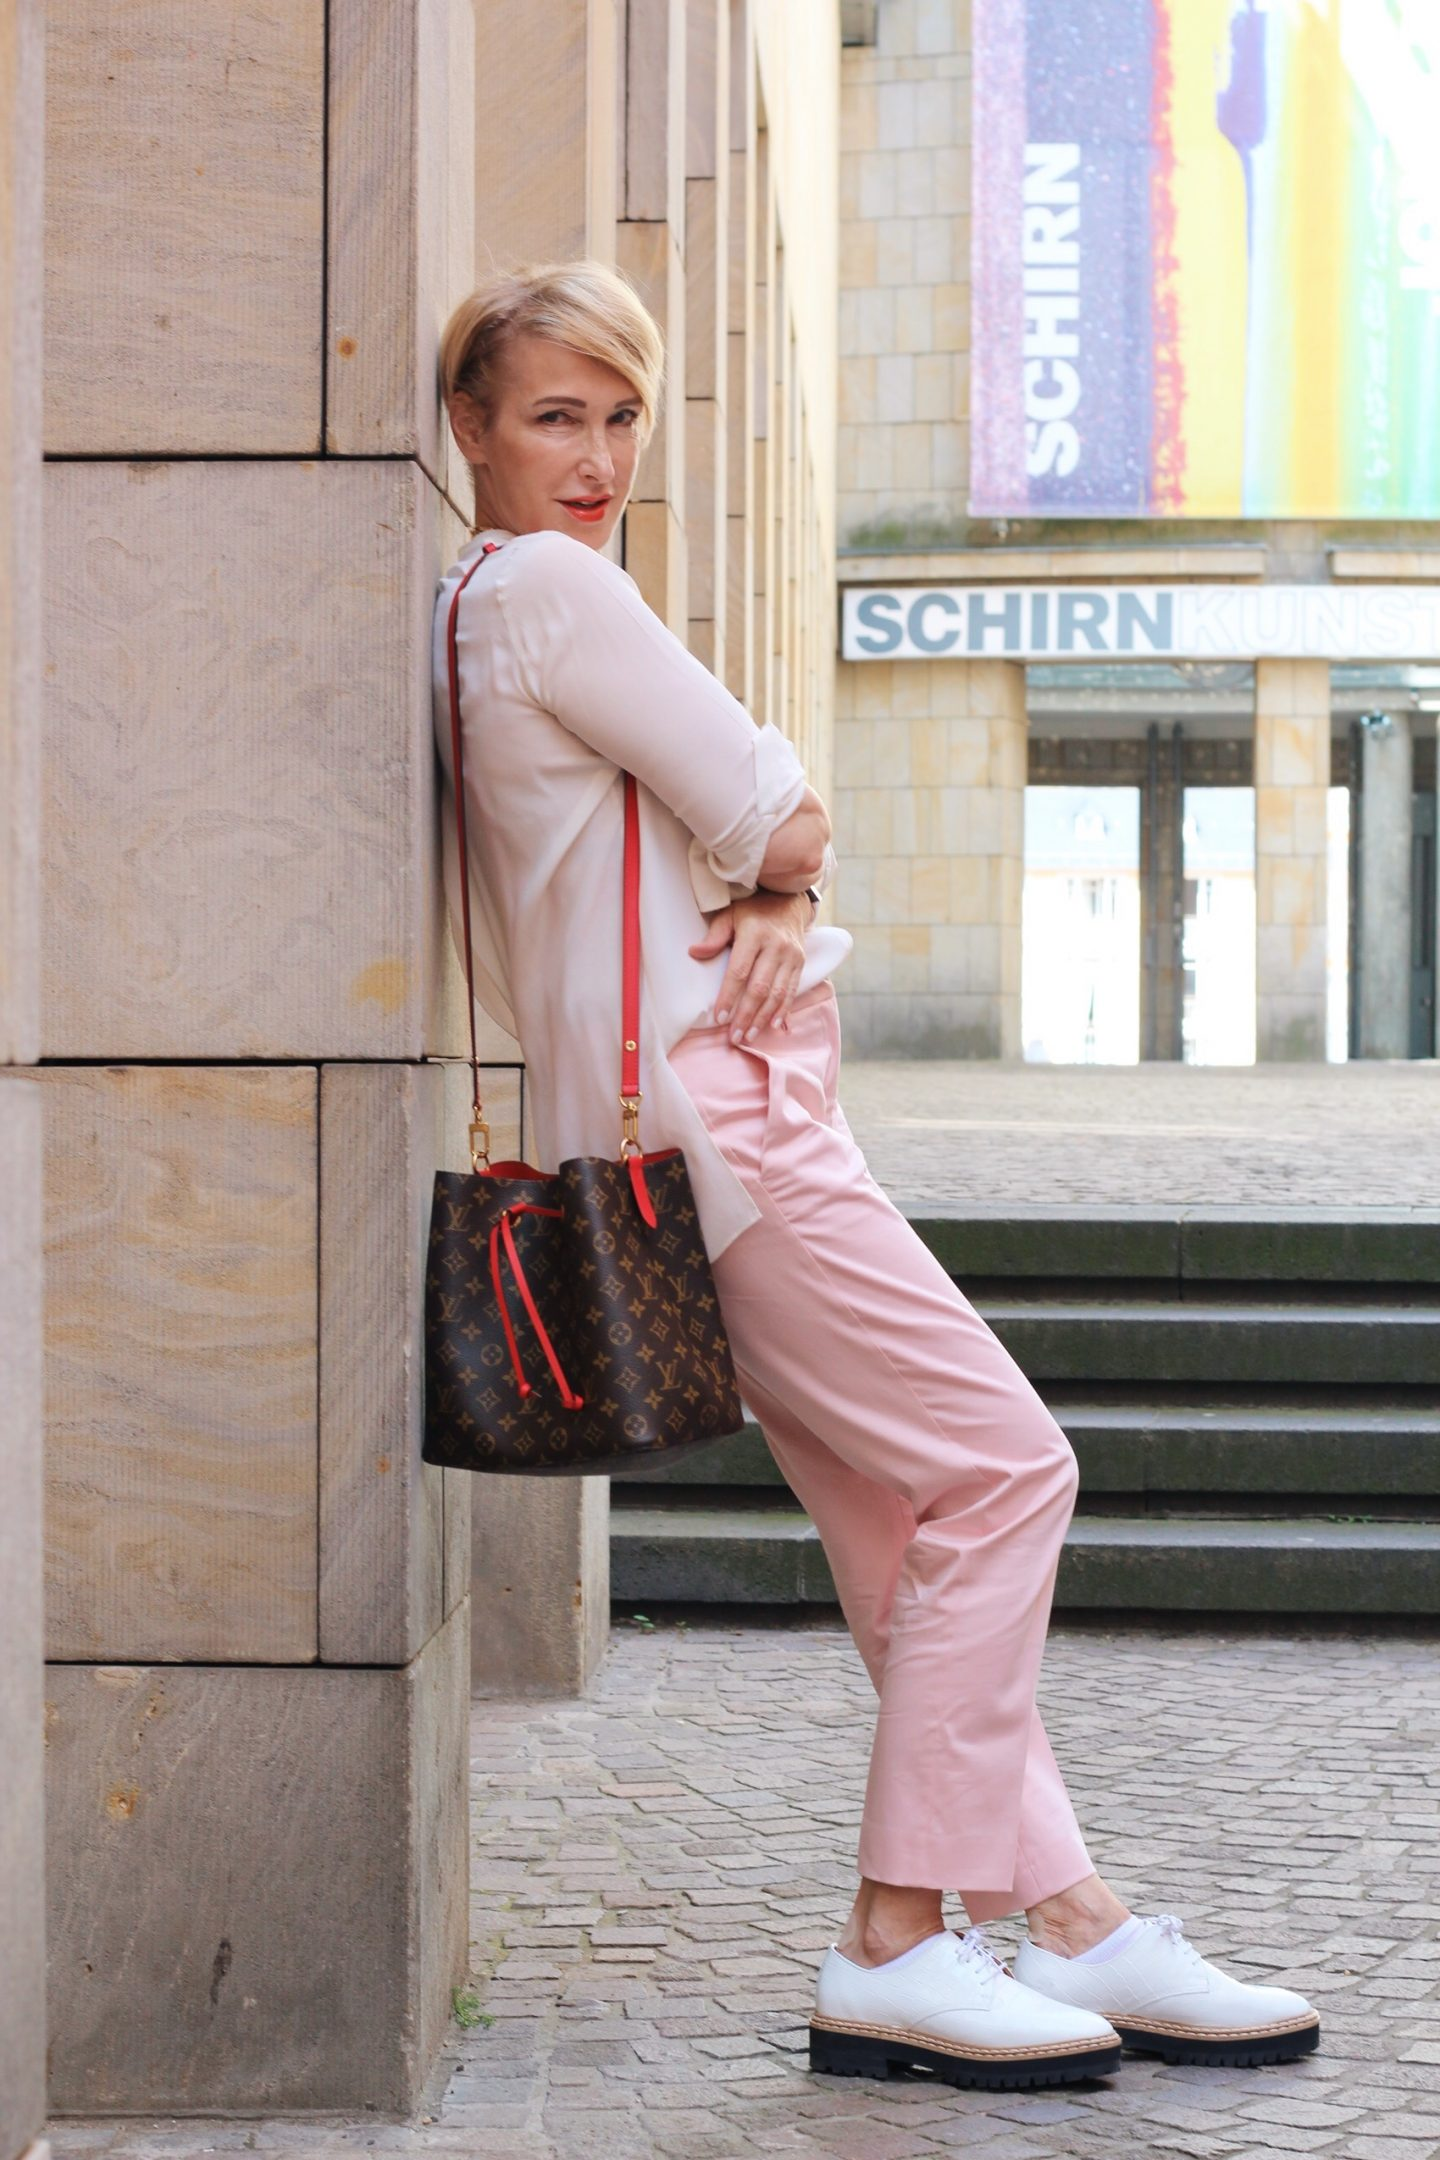 glamupyourlifestyle bloggerin Kooperationen Selbstständig ü-40-blog -50-blog